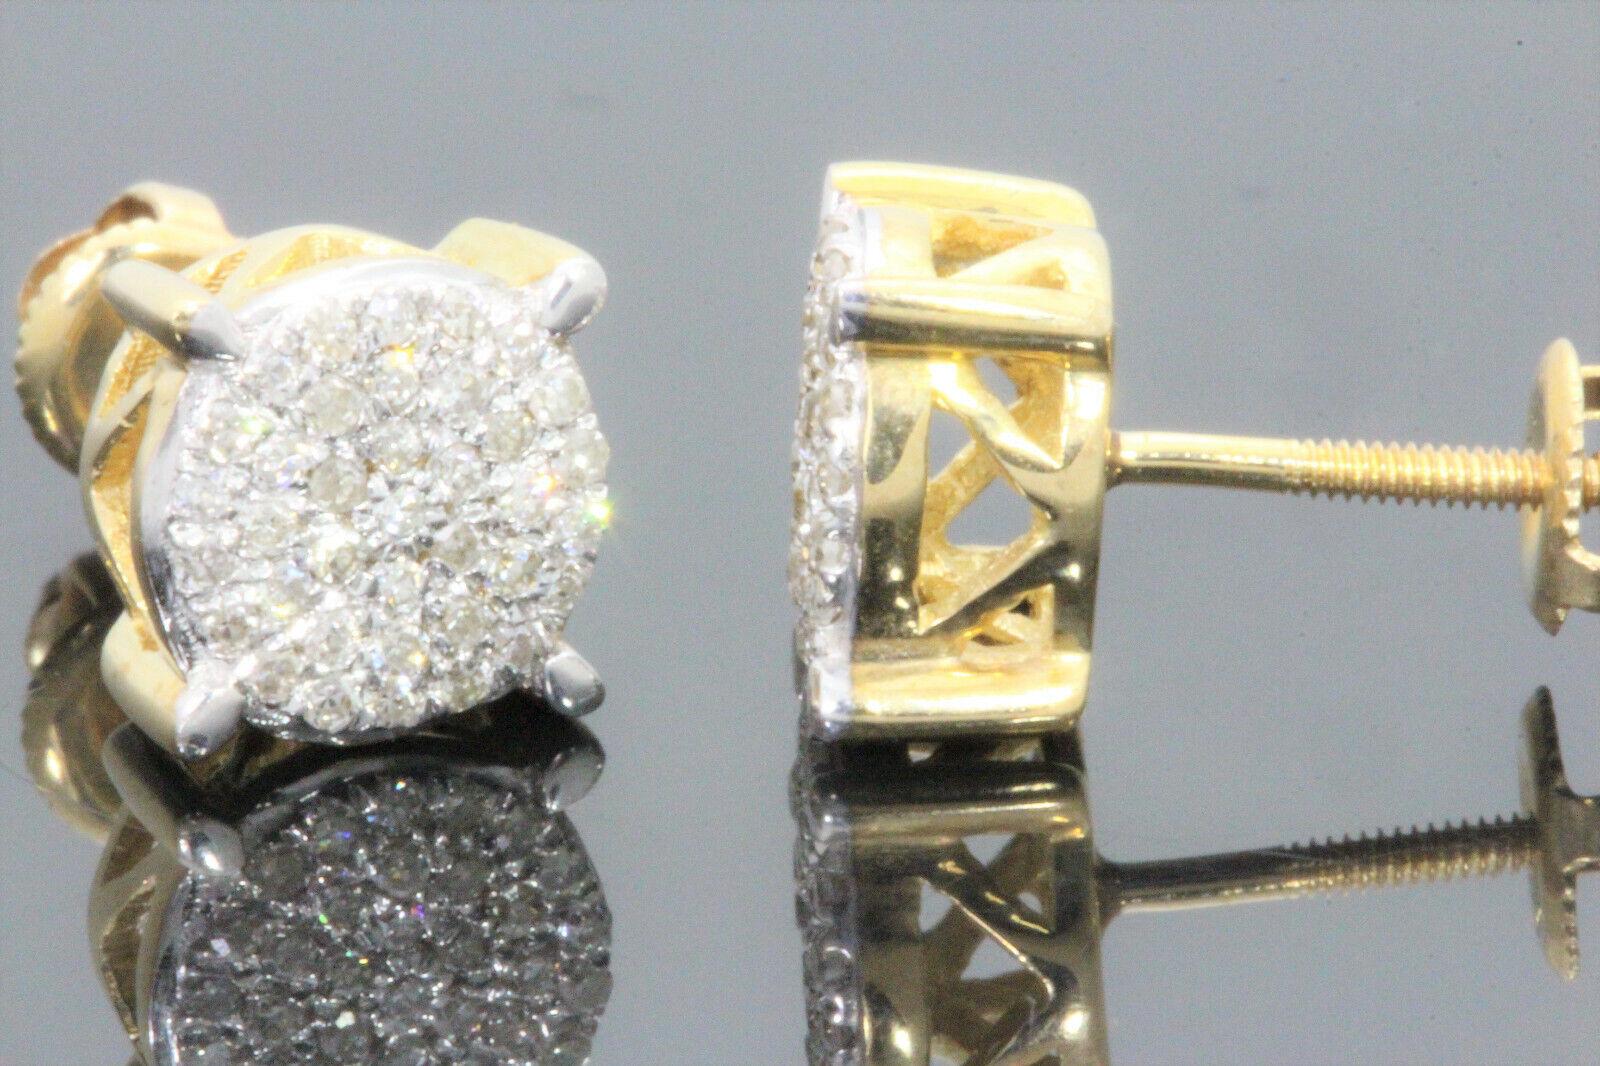 10K YELLOW GOLD .30 CARAT MENS WOMENS 7 mm 100% GENUINE DIAMONDS EARRING STUDS